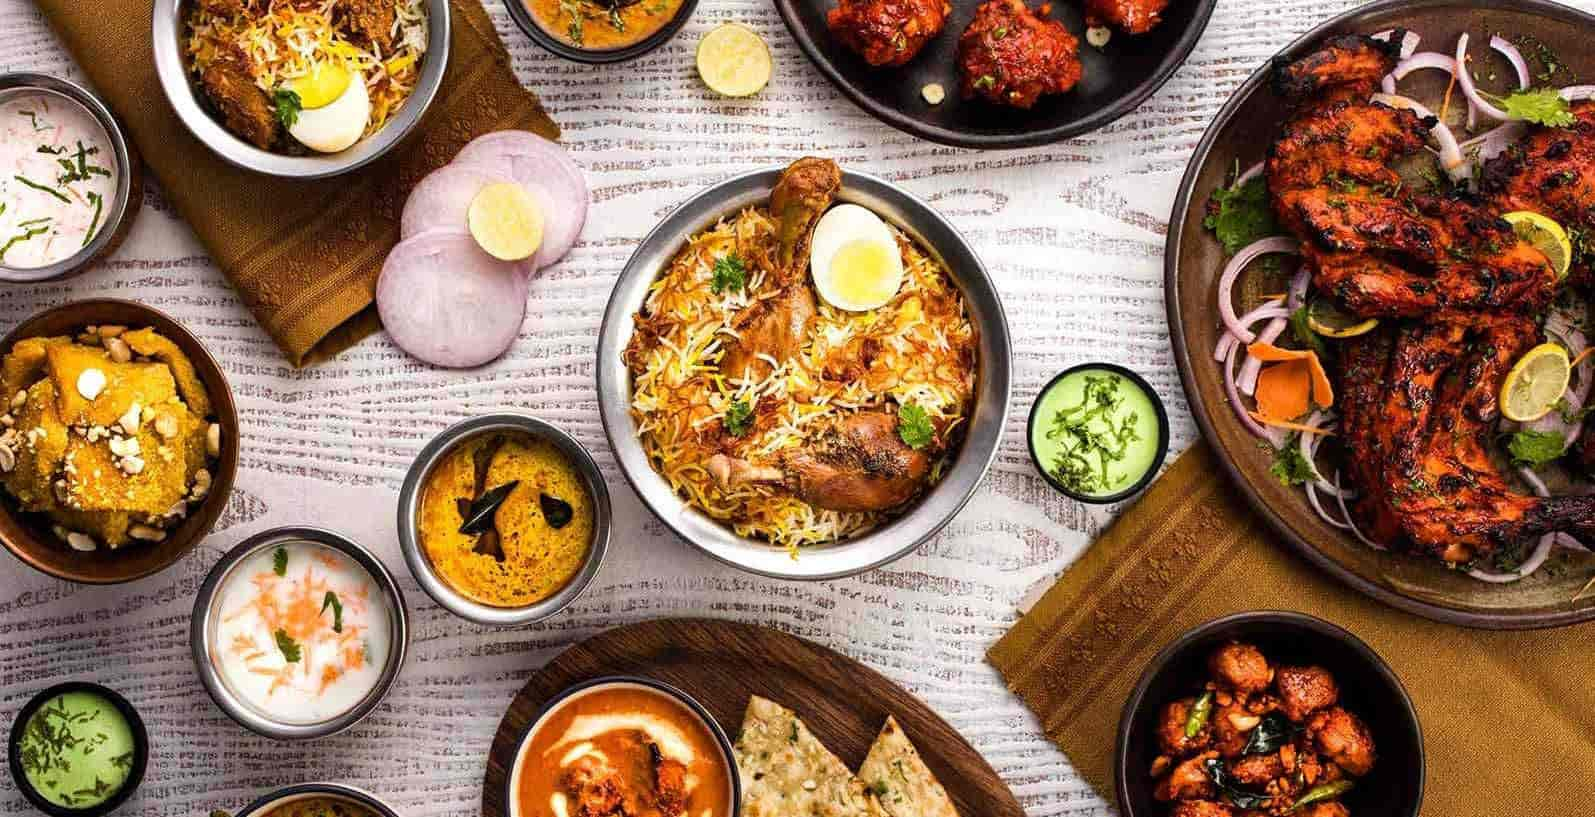 Top 10 Tandoori Restaurants In Connaught Place Delhi Best Restaurants Near You Serving Tandoori Food Justdial